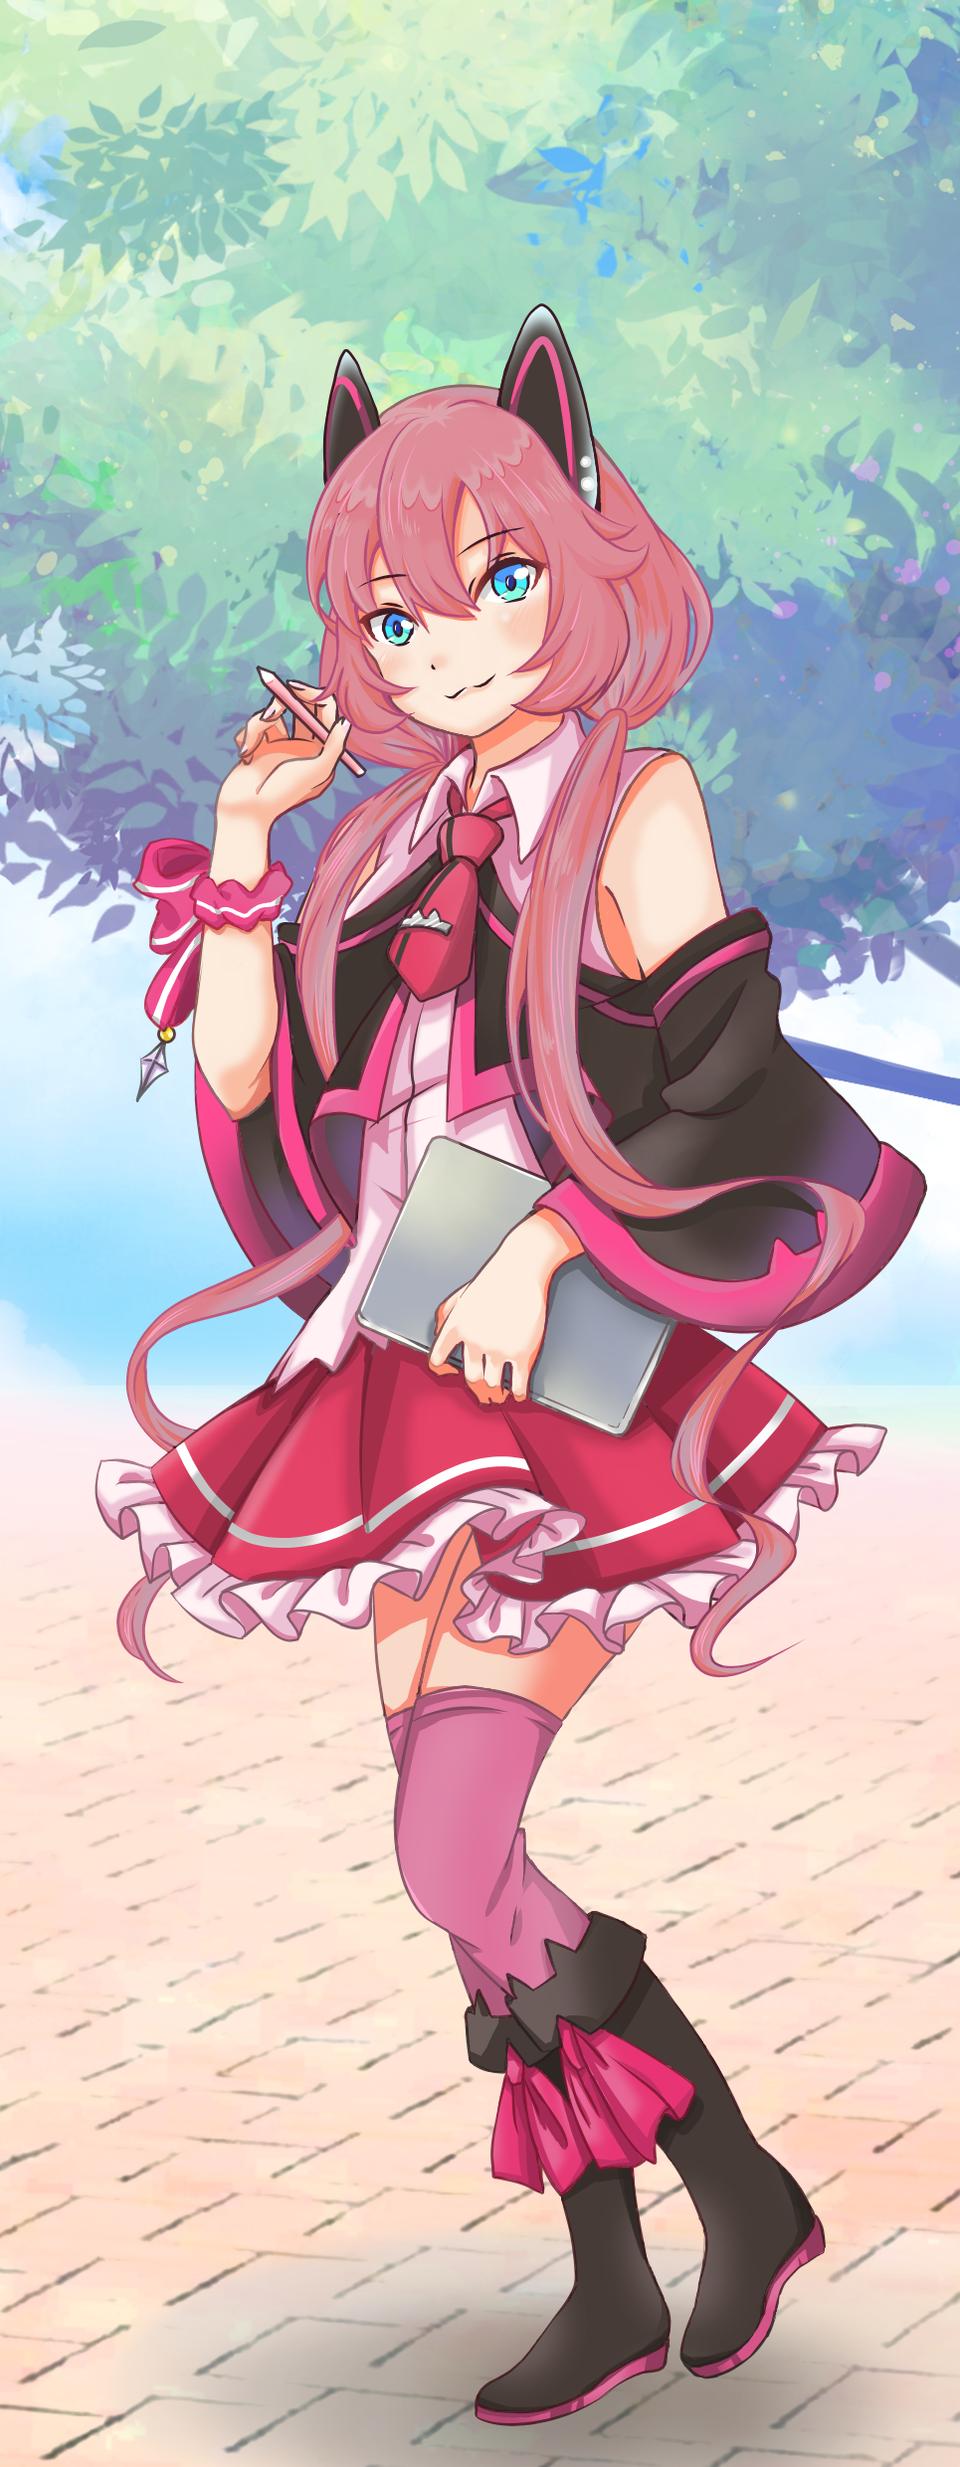 Pink cat Illust of Carrot PASTEL_SKETCH2020 個性的 girl 貓